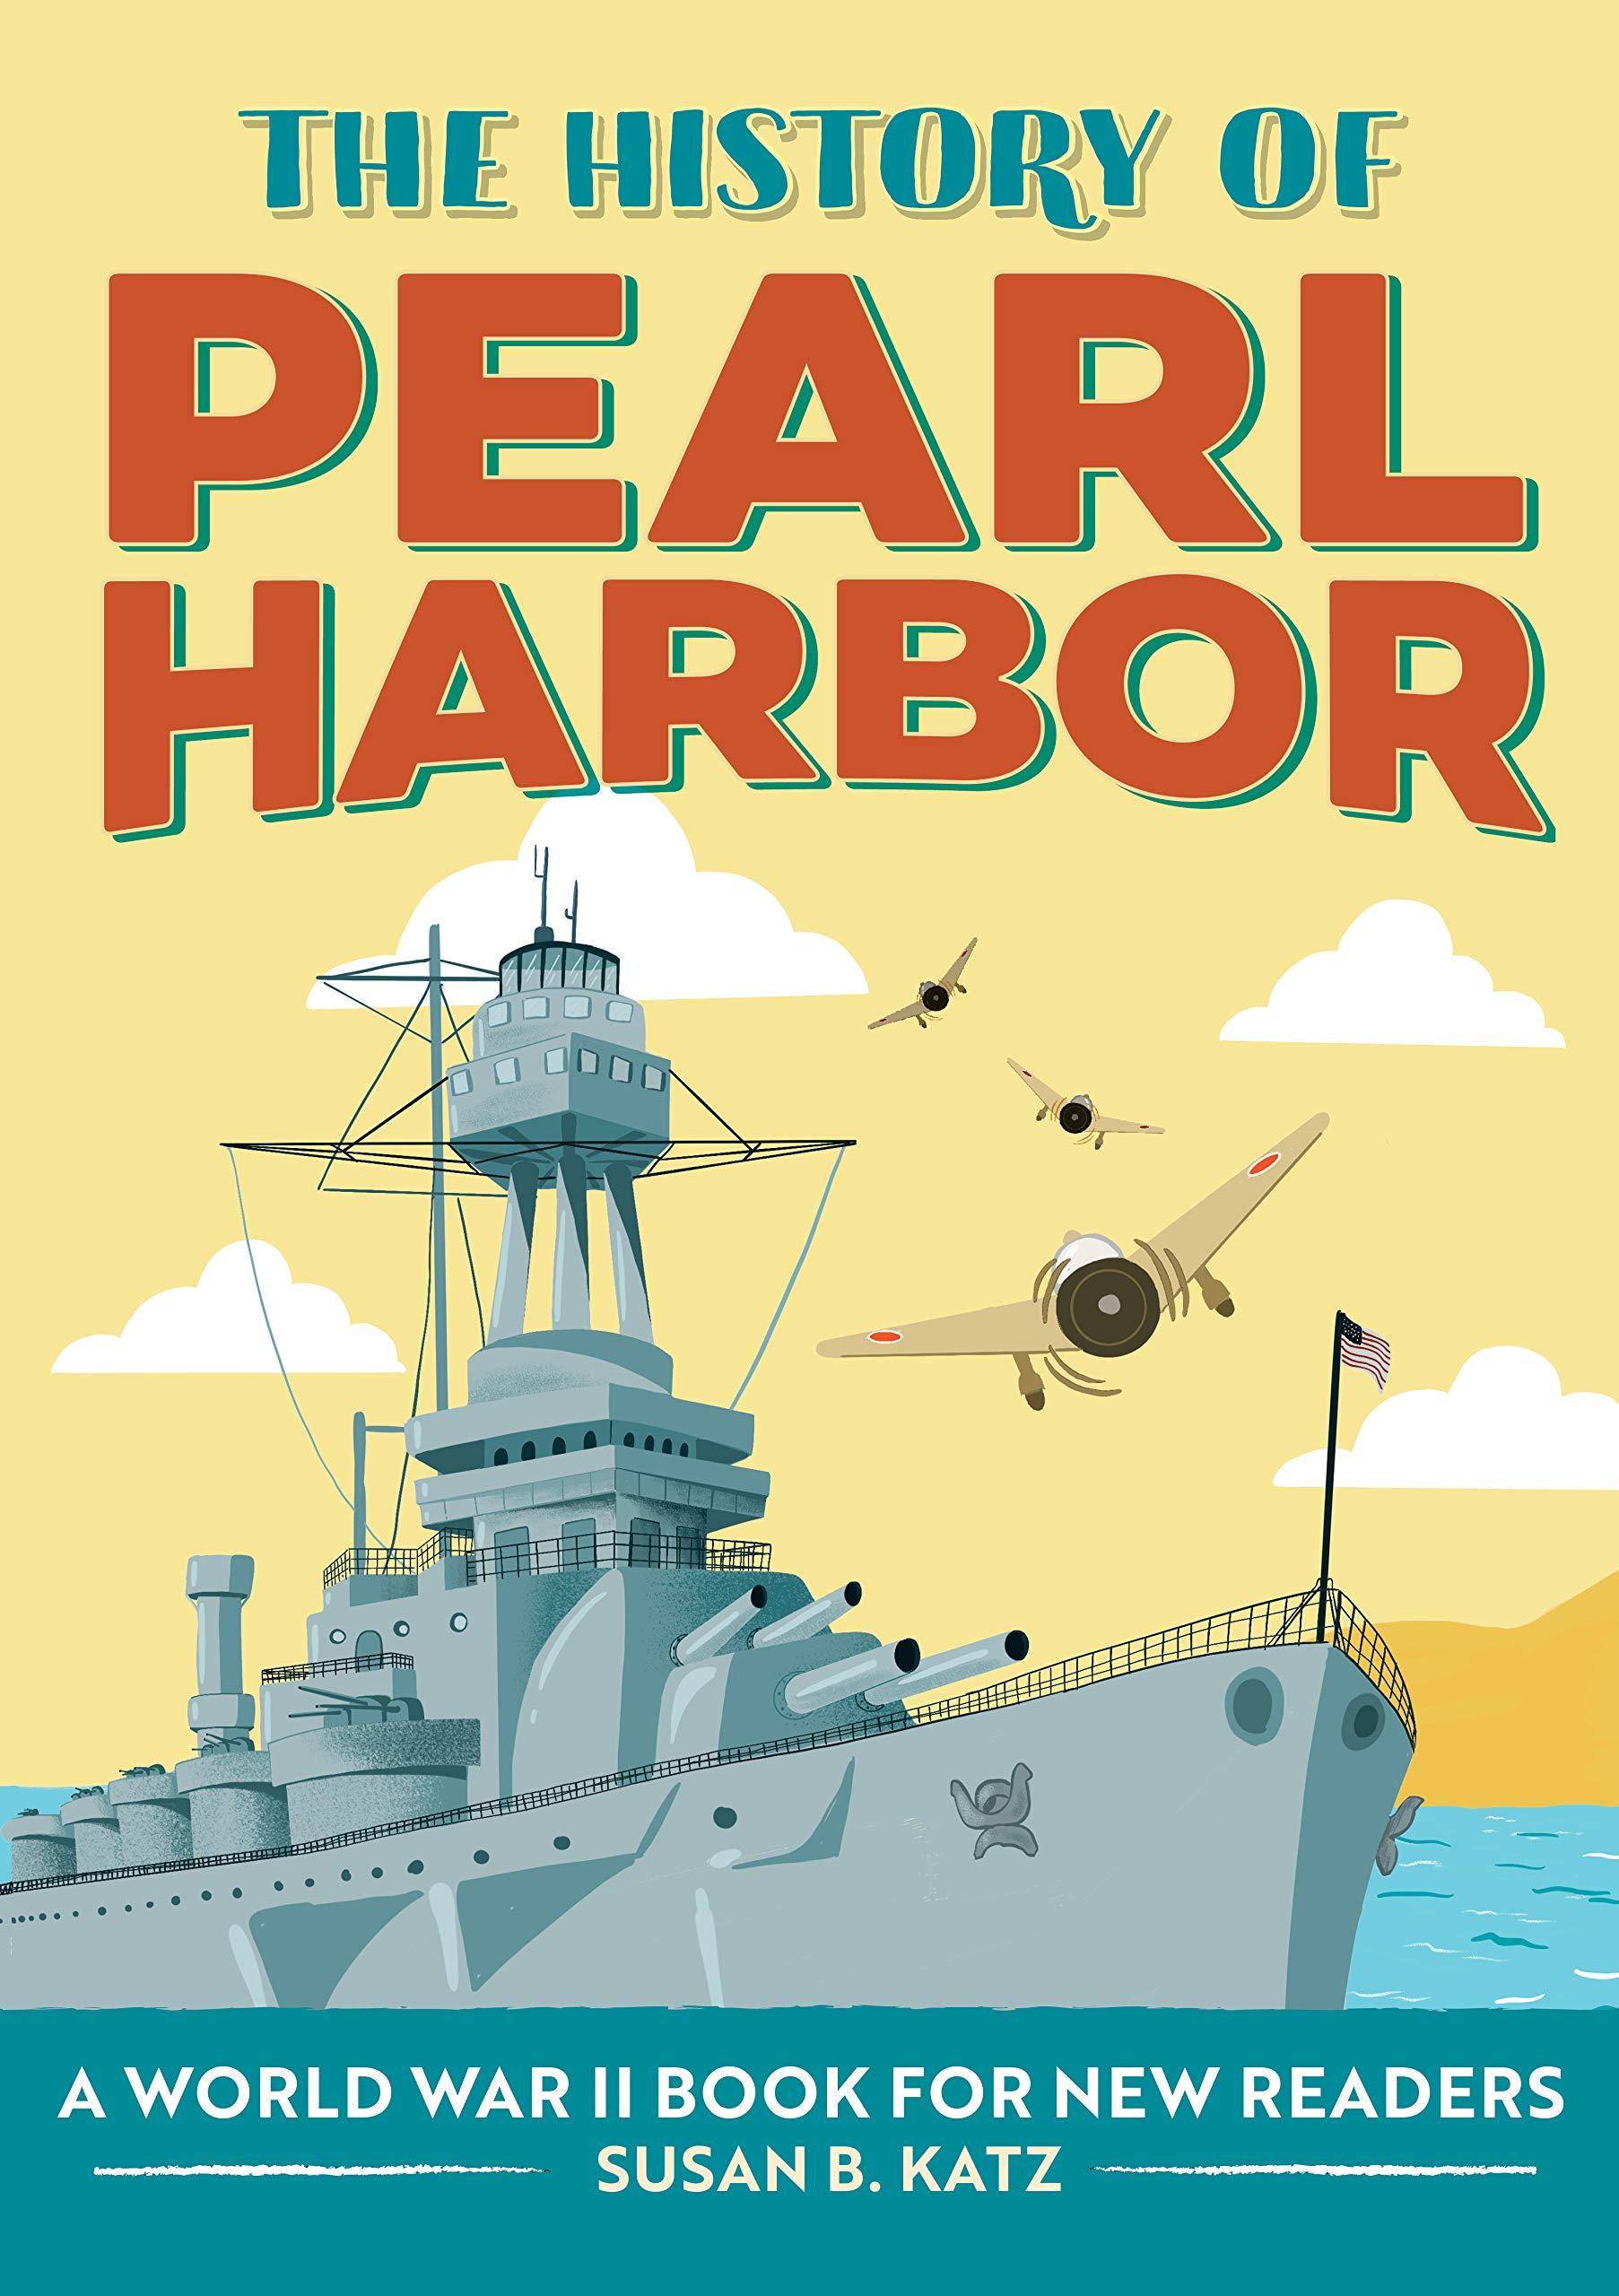 History of Pearl Harbor